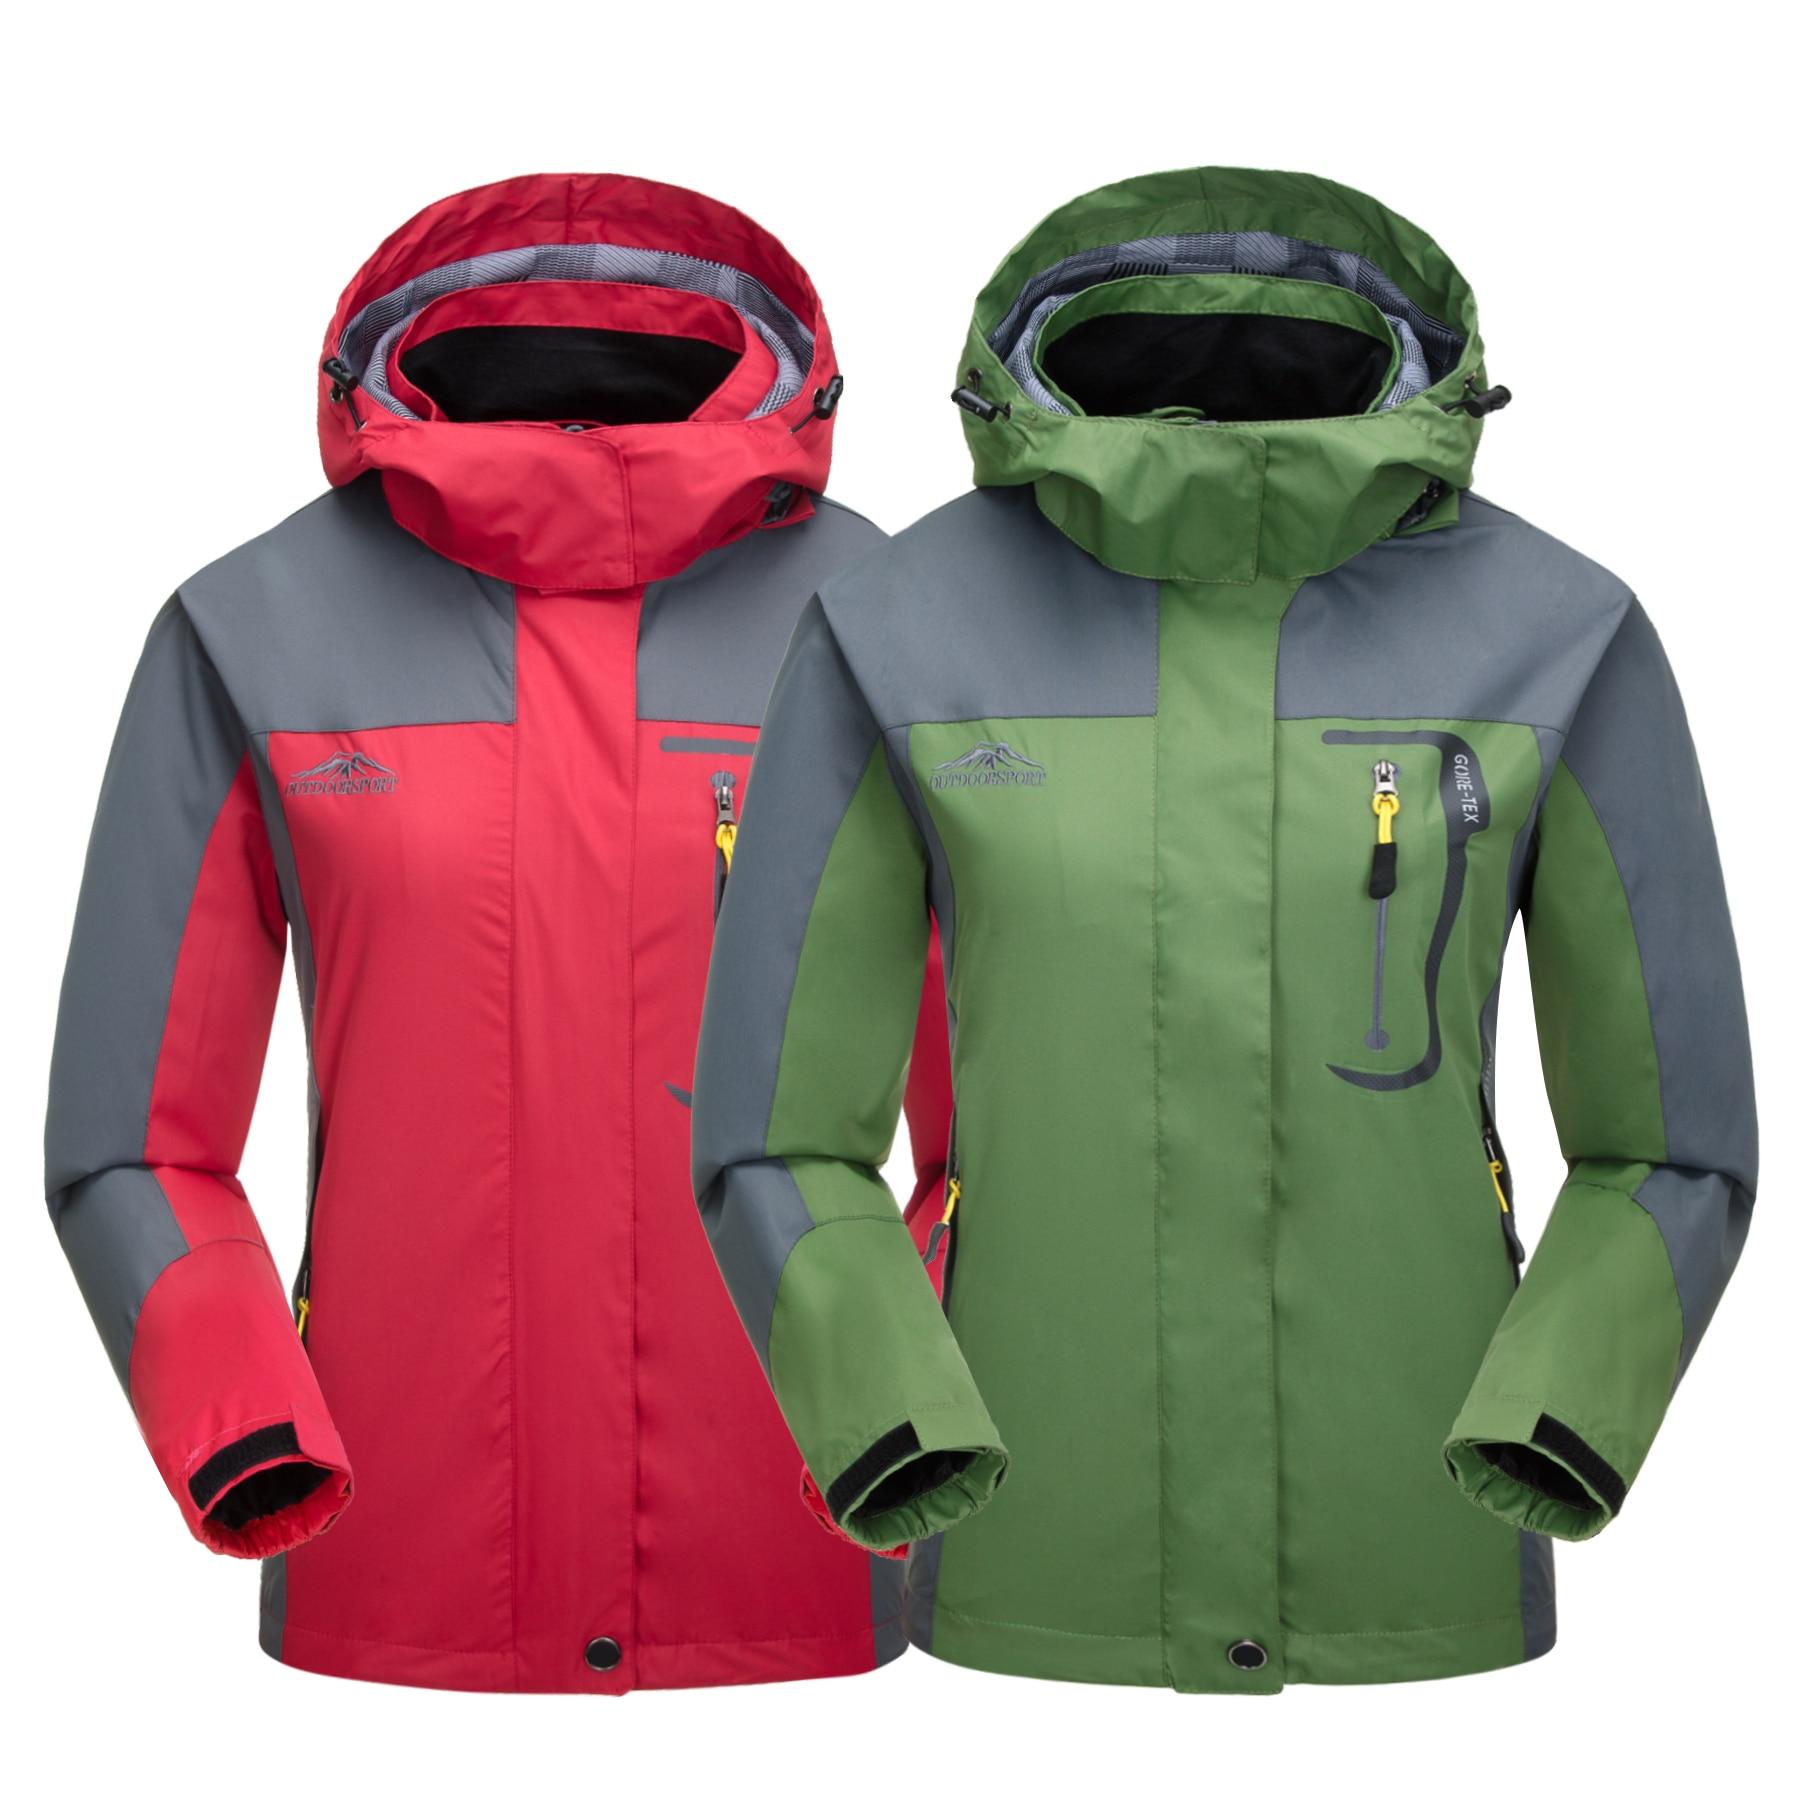 NEW Women Outdoor Camping Hiking Climbing Jacket Coat Top Outwear Windbreaker Sports Apparel Tracksuit Sweater Athletic Blazers